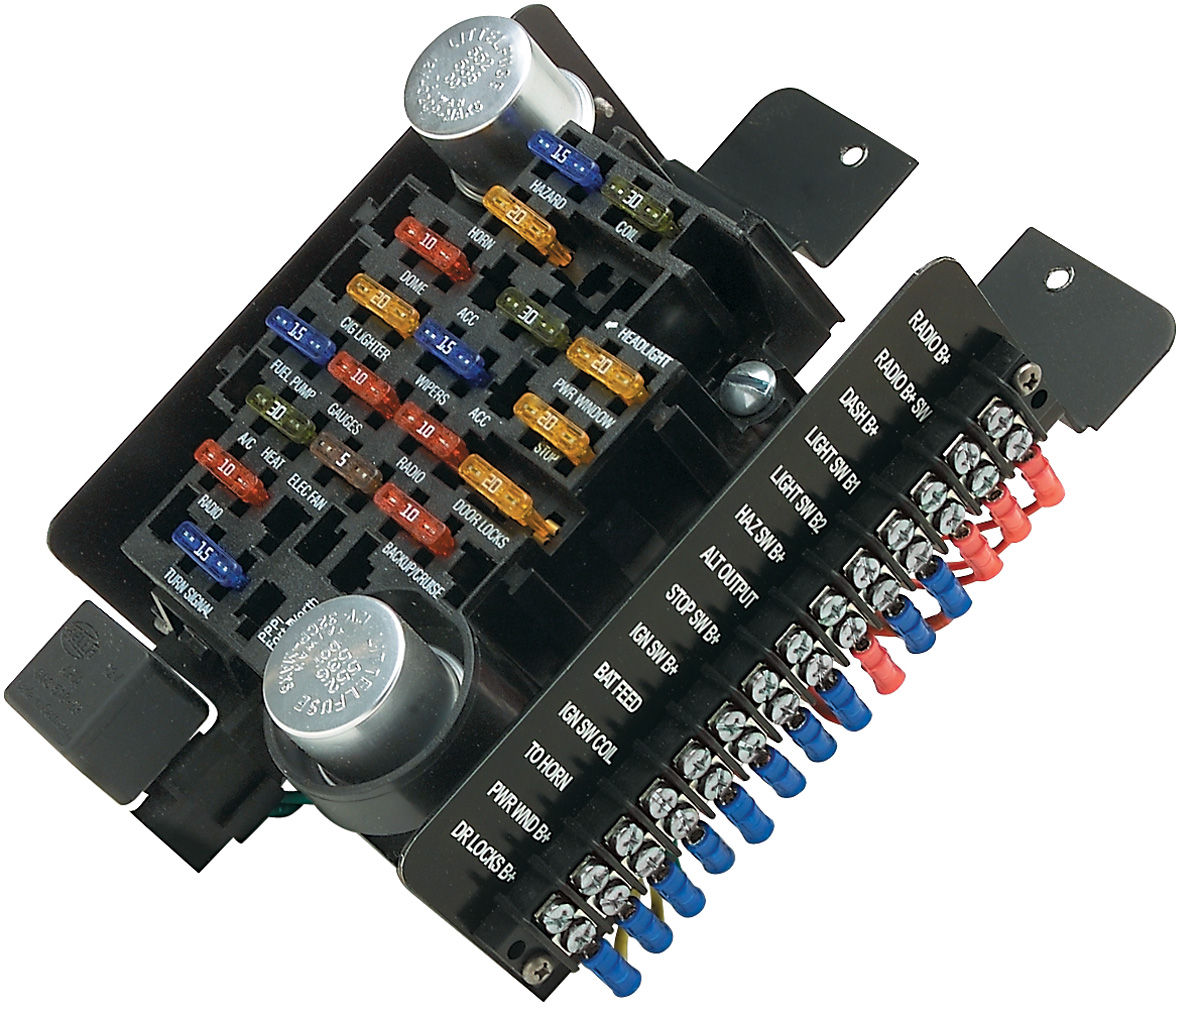 medium resolution of fuse box 1985 el camino ss choo choo custom simple wiring diagram rh 58 lodge finder de 79 cutlass 85 cutlass fuse box